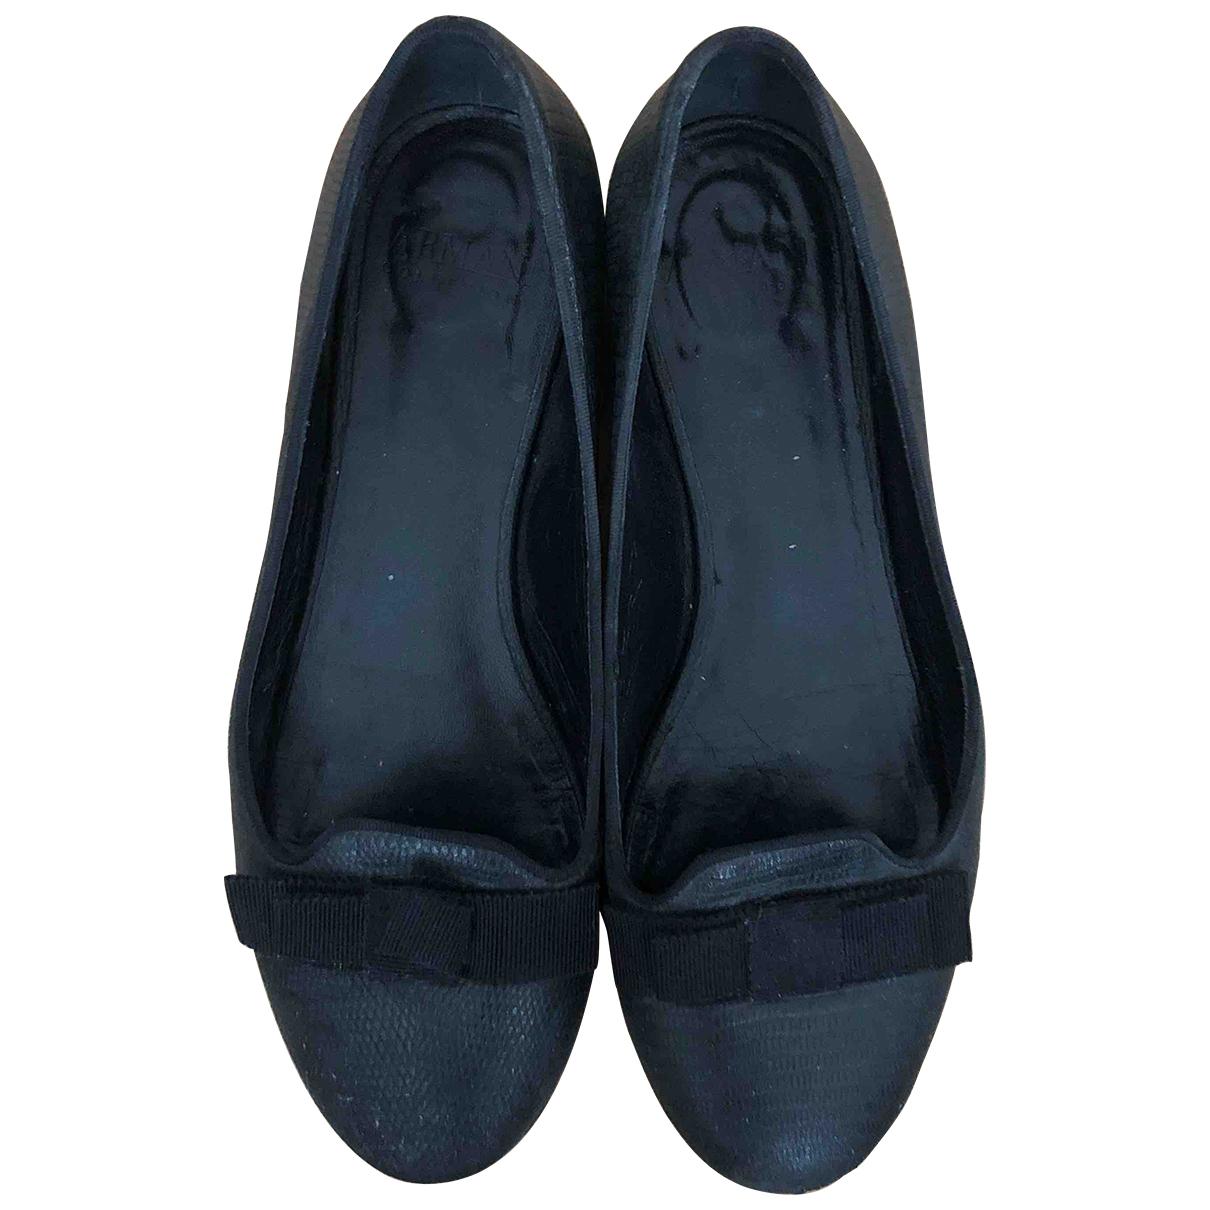 Armani Collezioni \N Black Leather Ballet flats for Women 4 UK